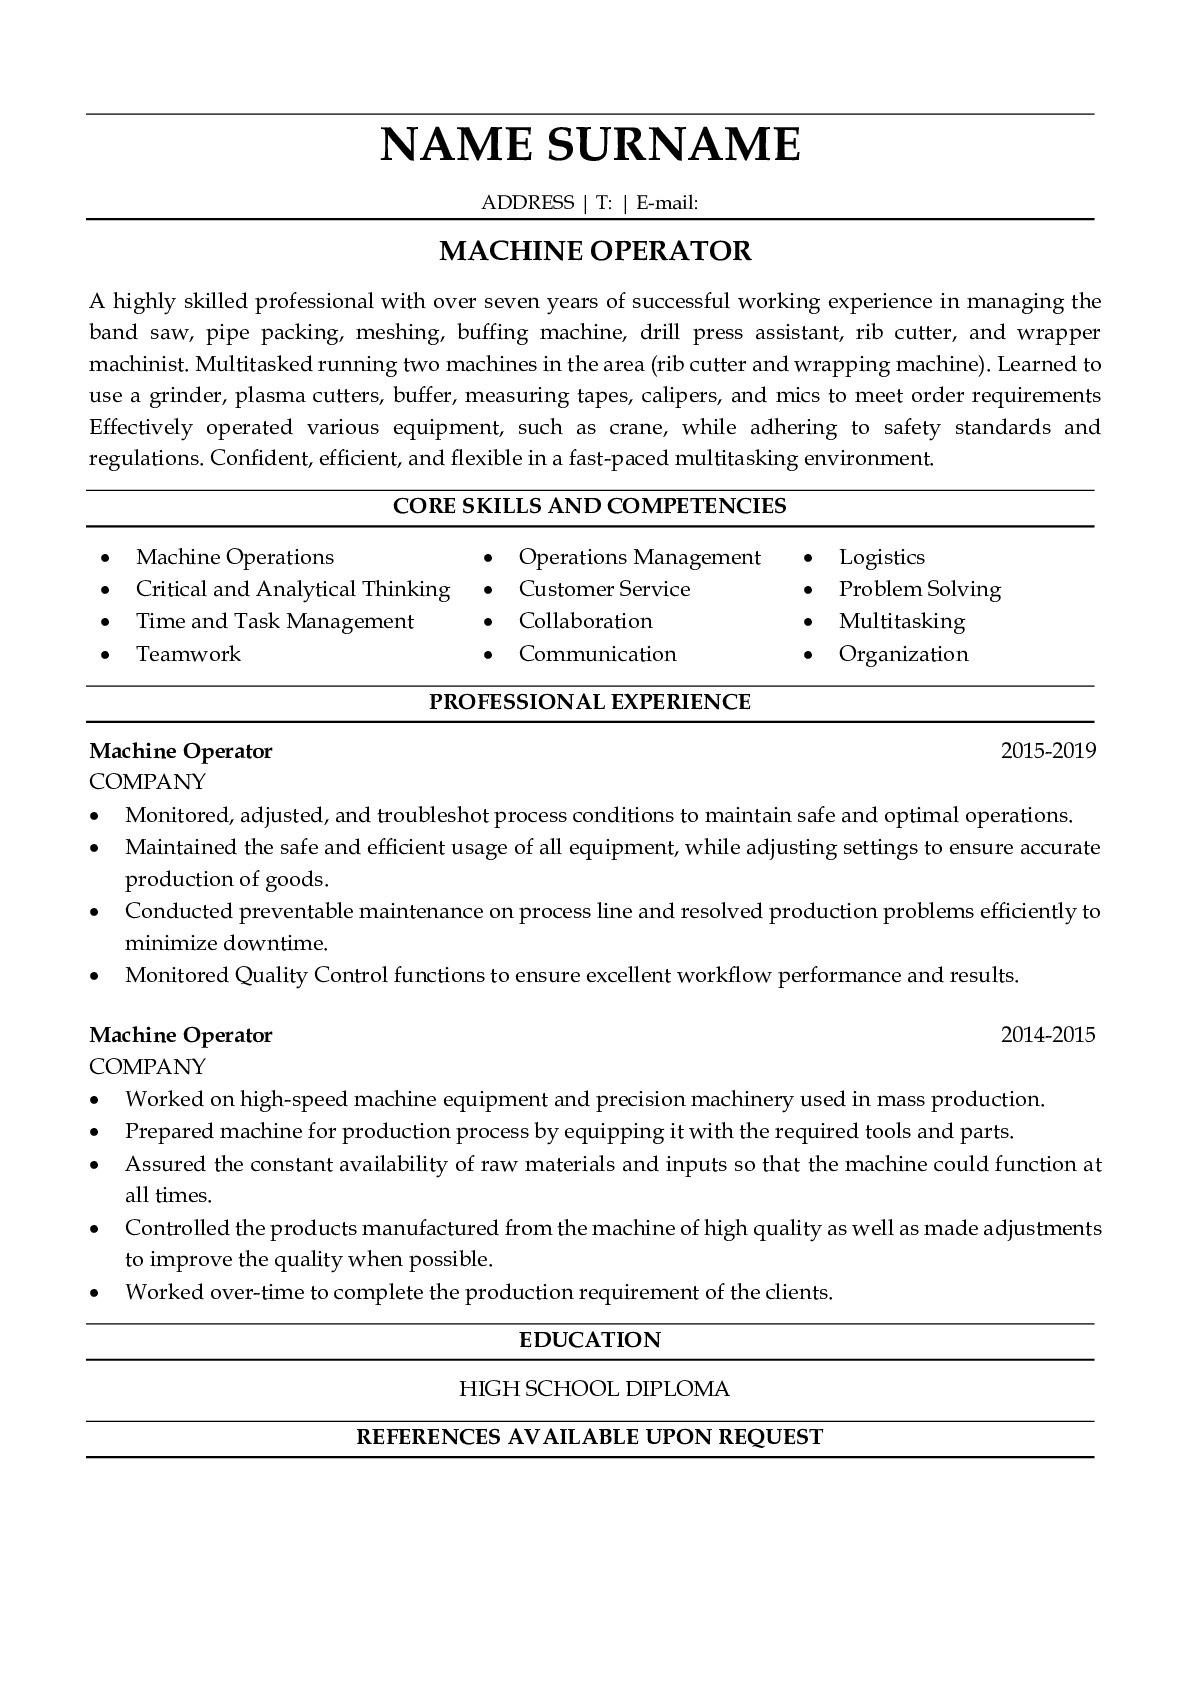 Resume Example for Machine Operator